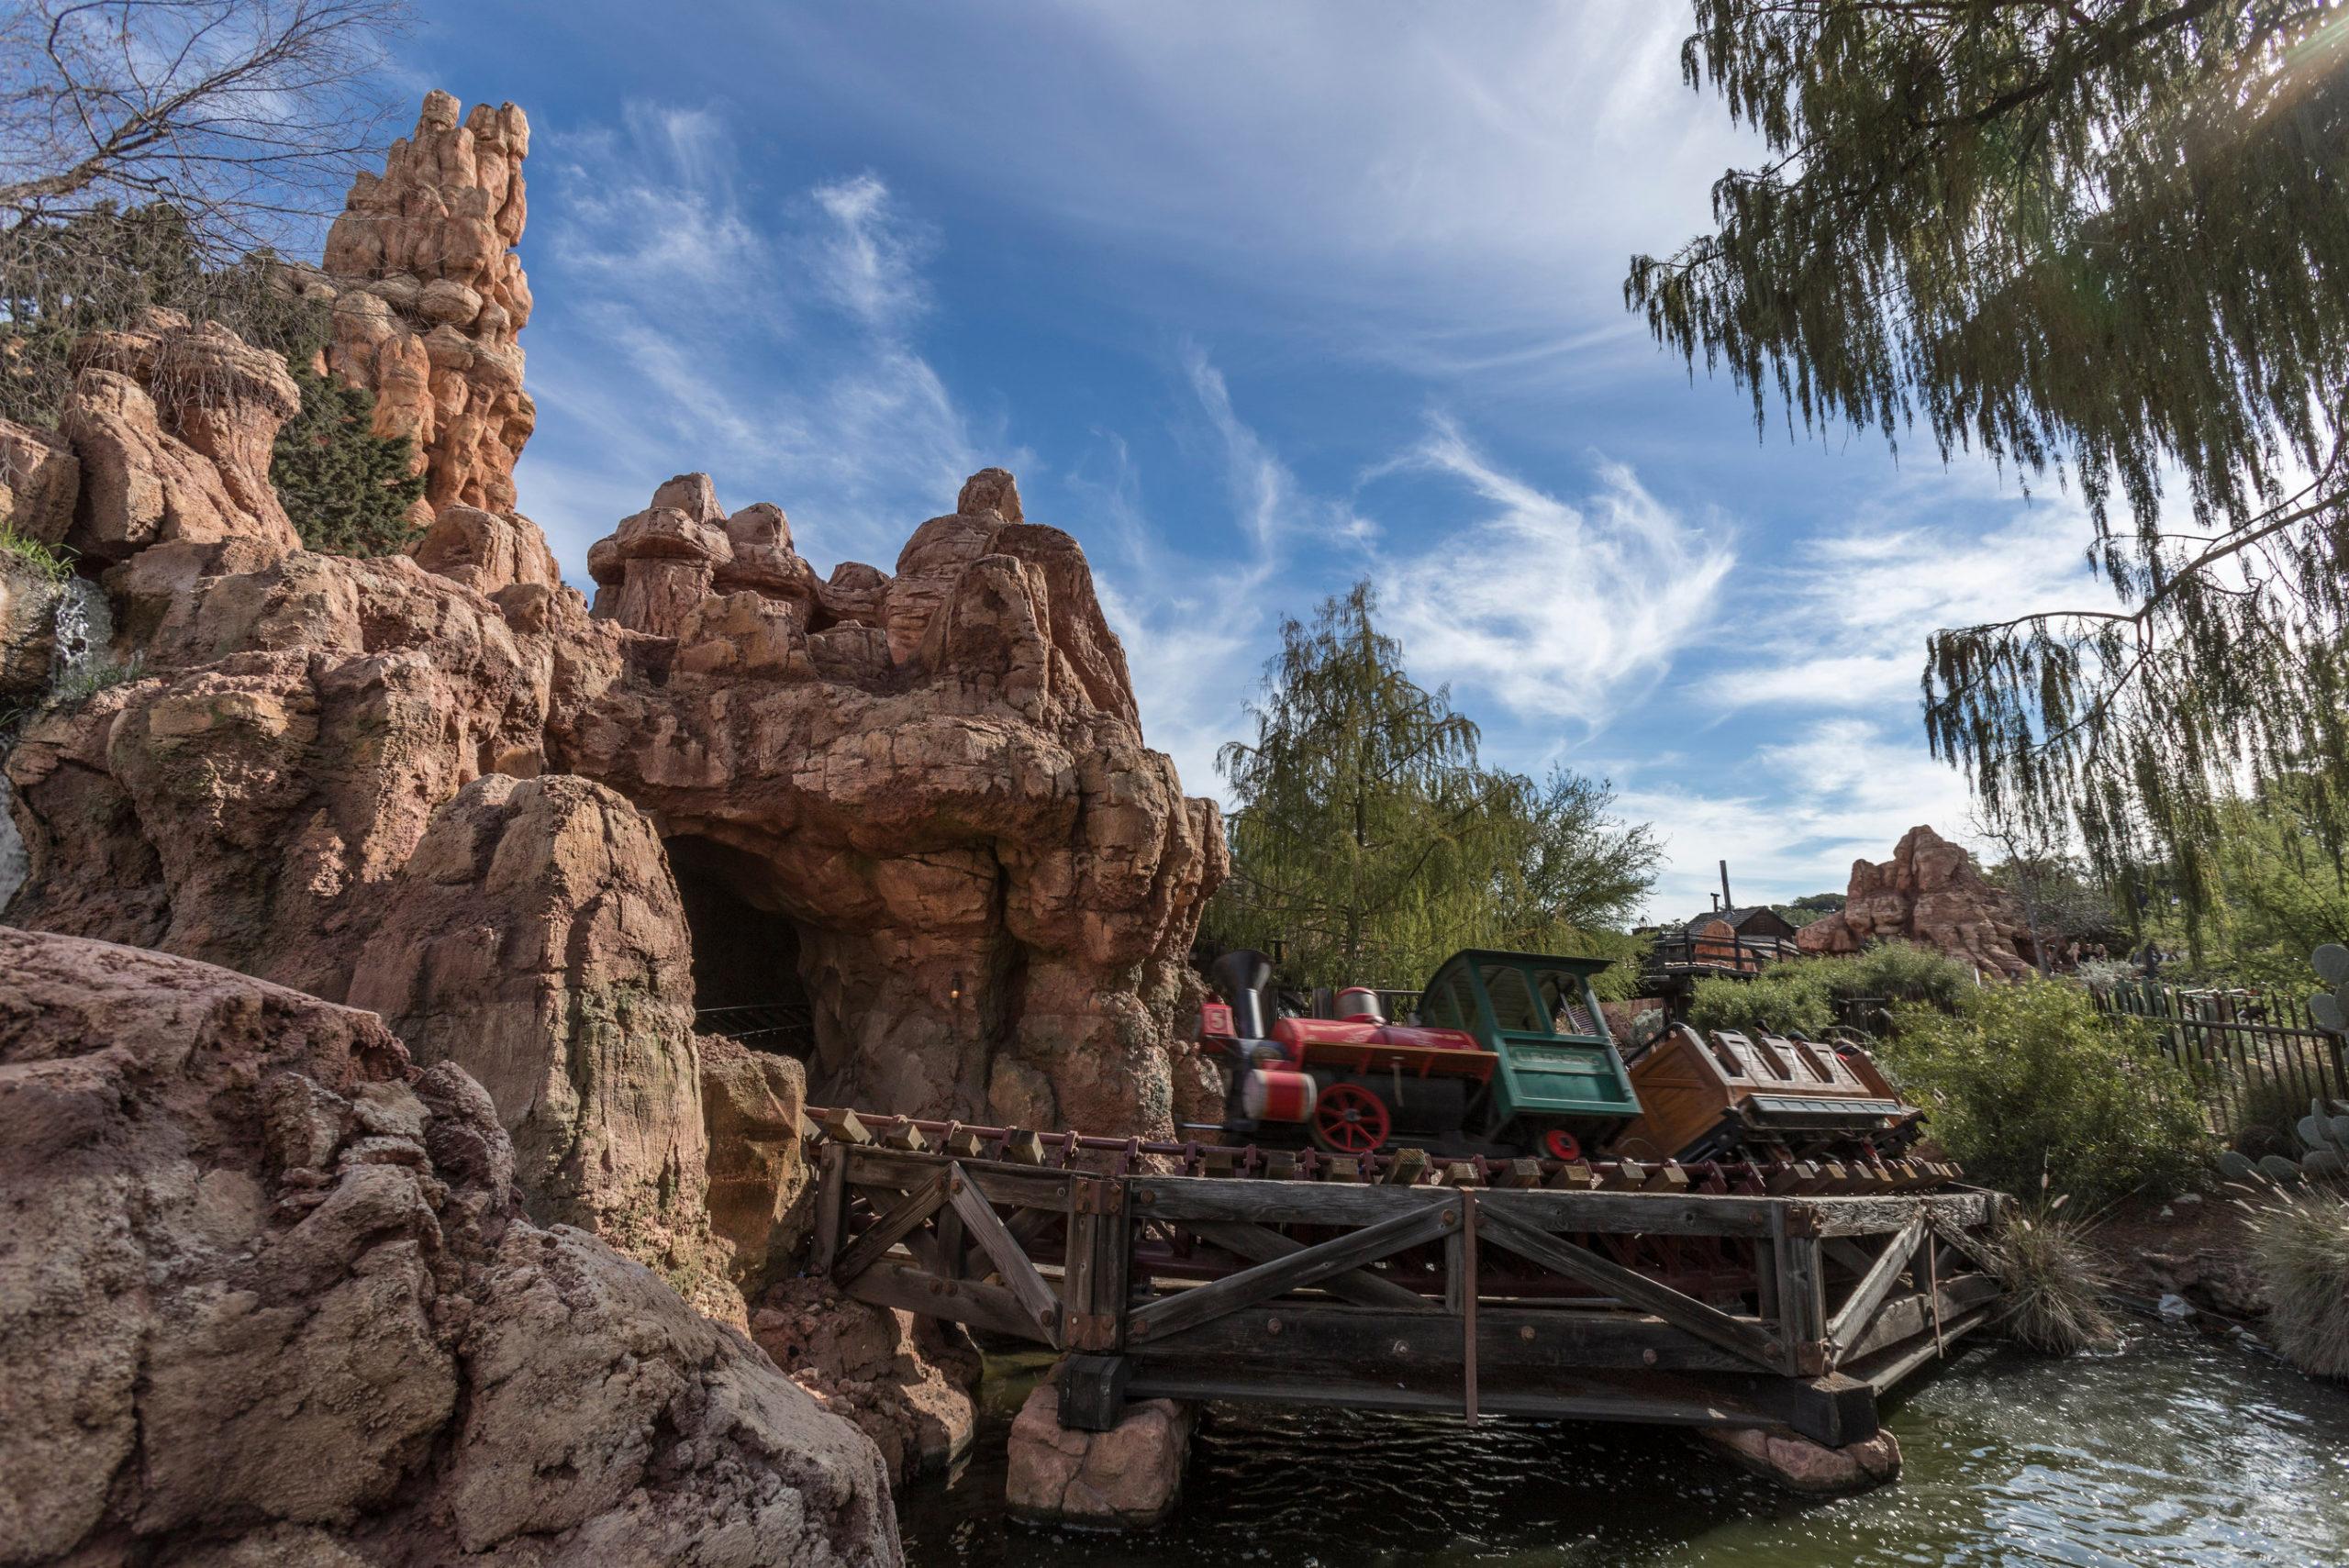 Big Thunder Mountain Railroad in Frontierland at Disneyland Park in Anaheim, Calif.